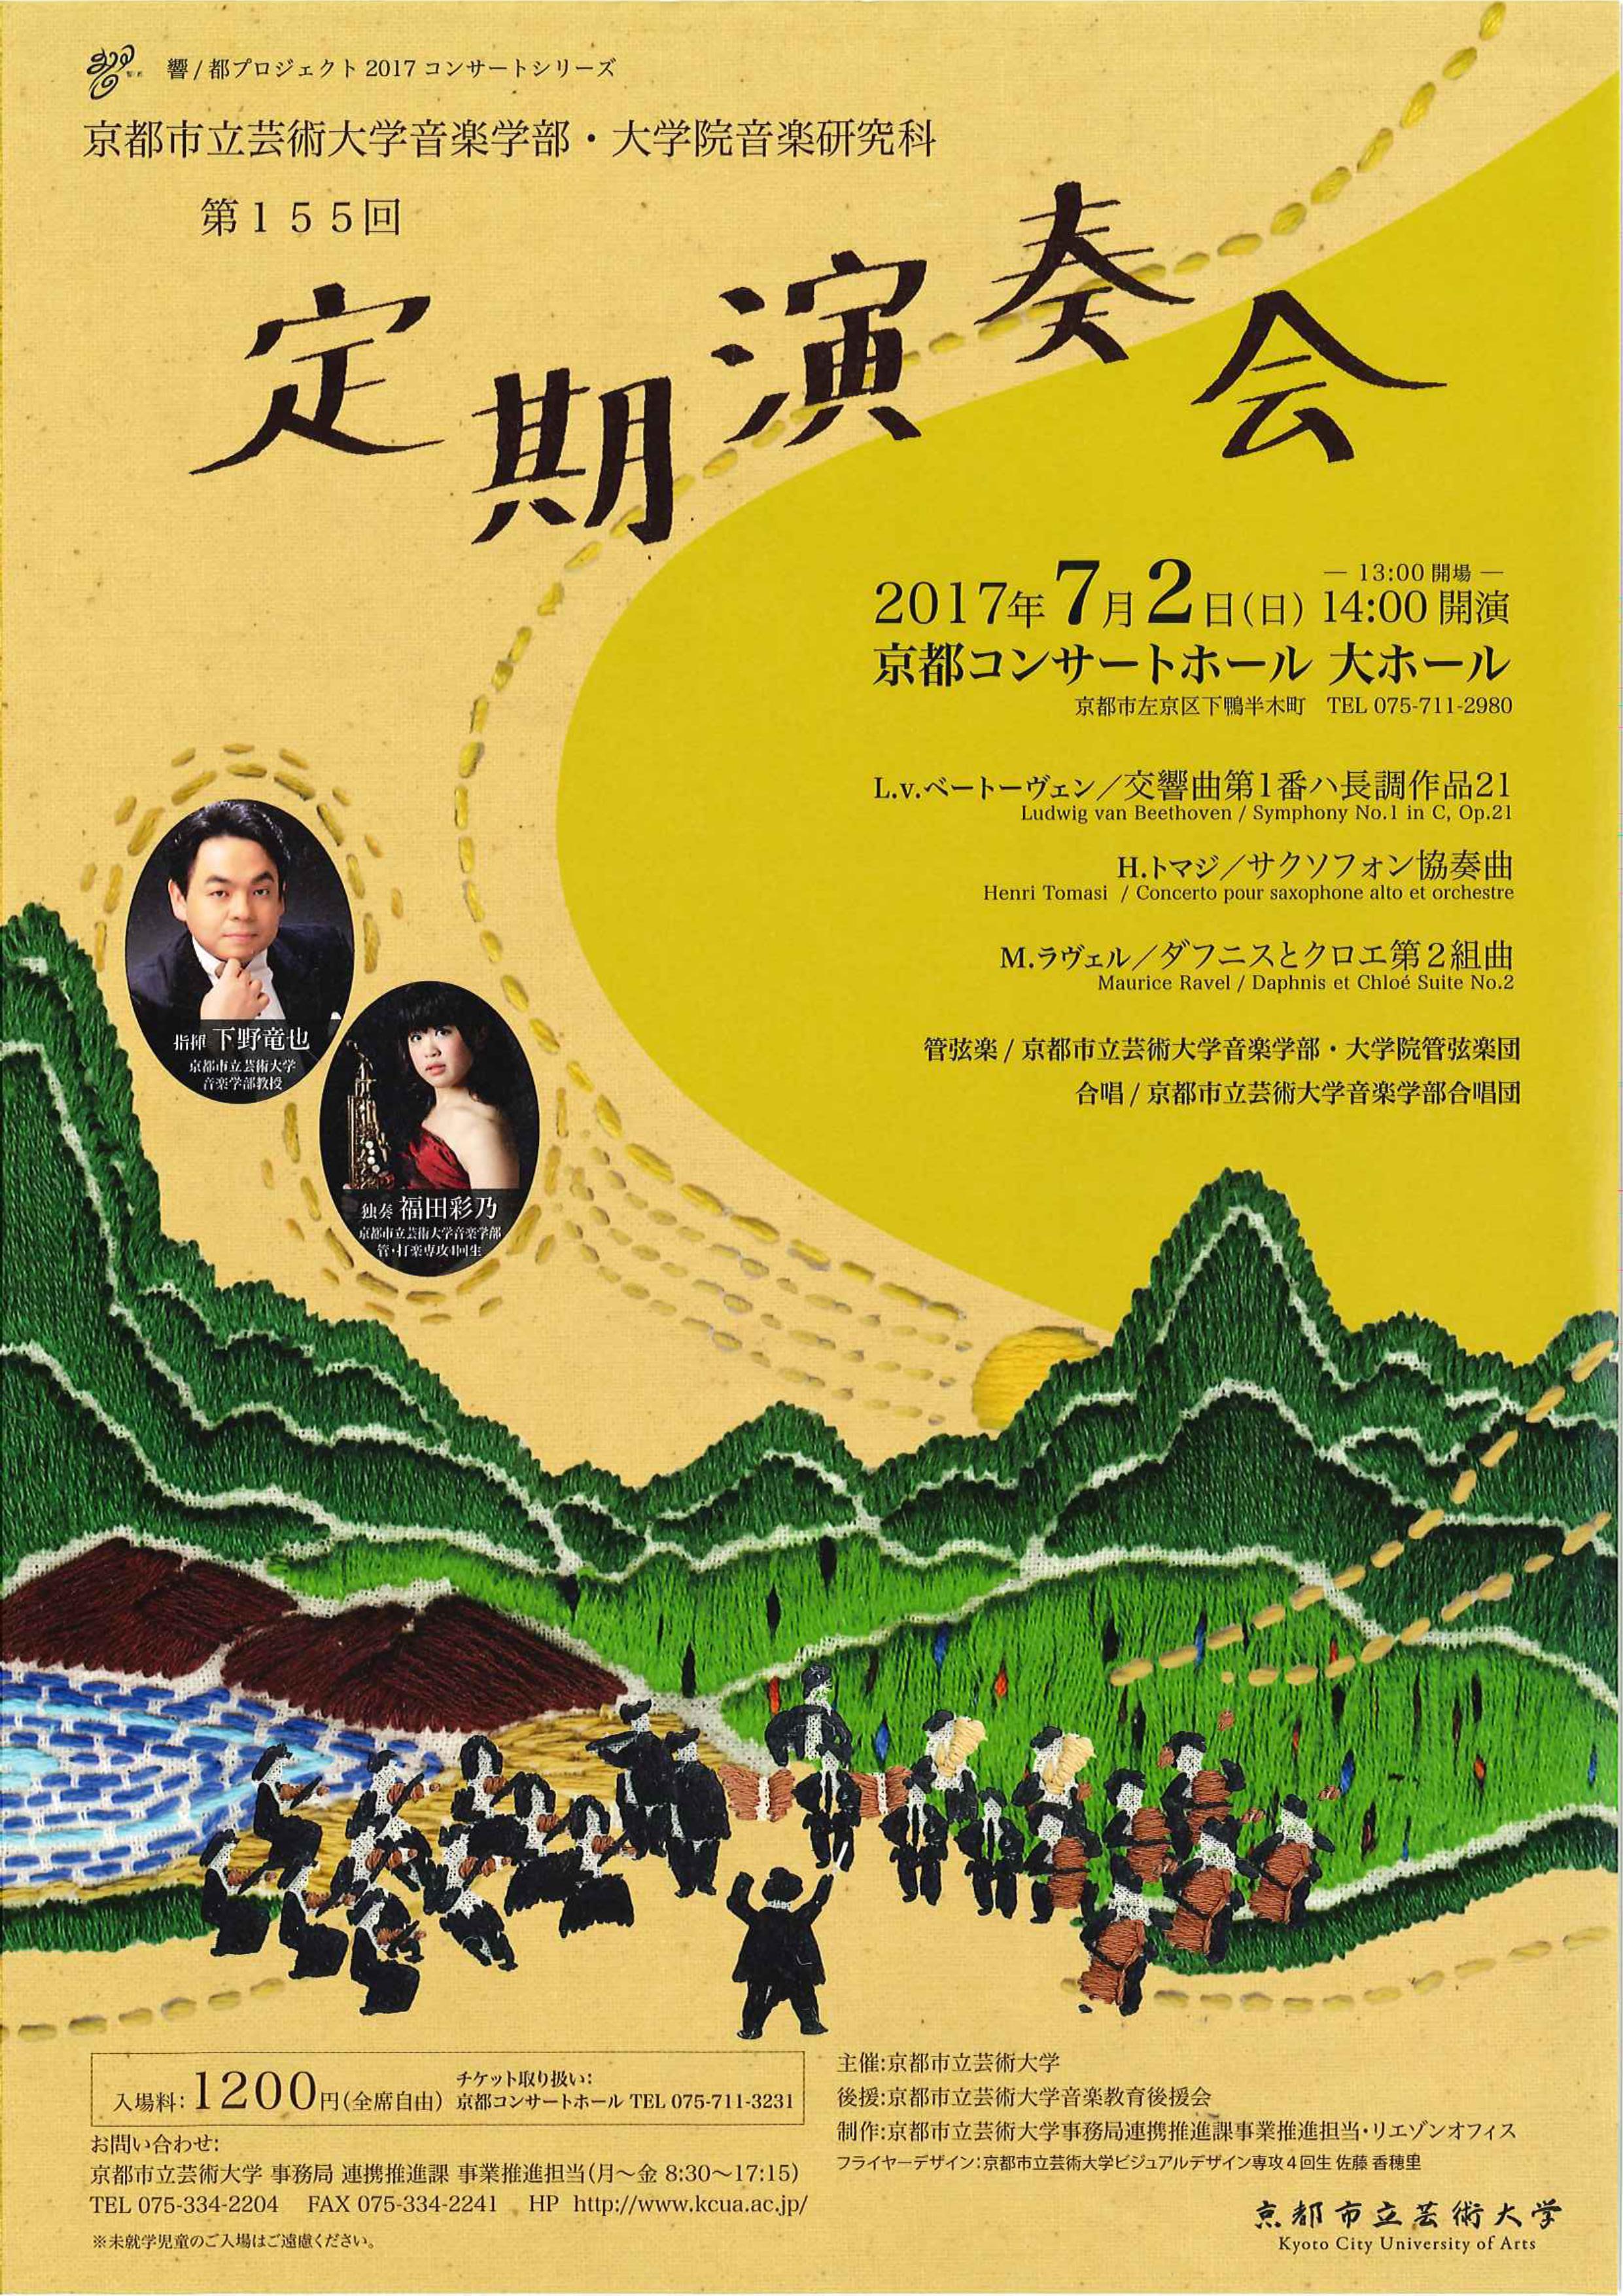 This week's concert (26 June – 2 July, 2017)